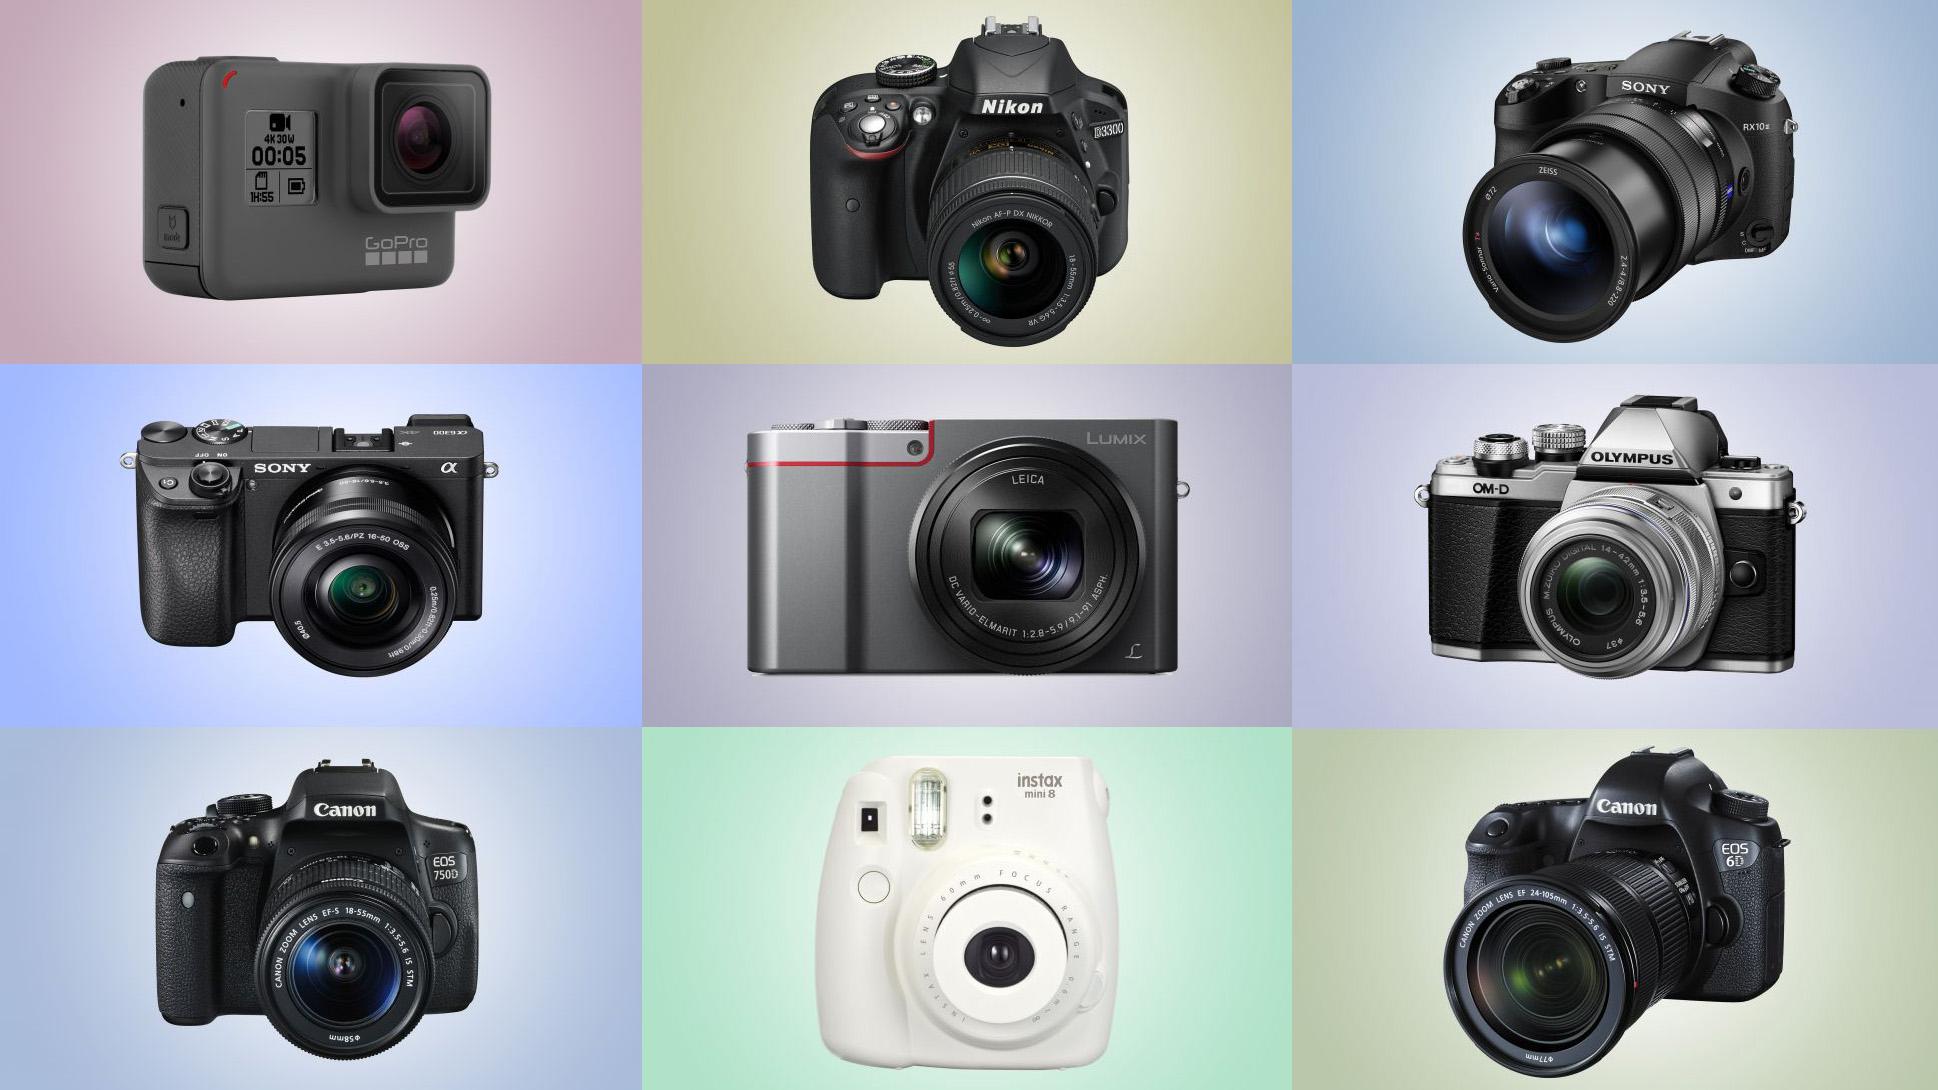 Lovely On Black Friday 2017 Techradar Canon T6 Vs Nikon D3400 Images Canon T6i Vs Nikon D3400 Cameras Deals To Look Out dpreview Canon T6 Vs Nikon D3400